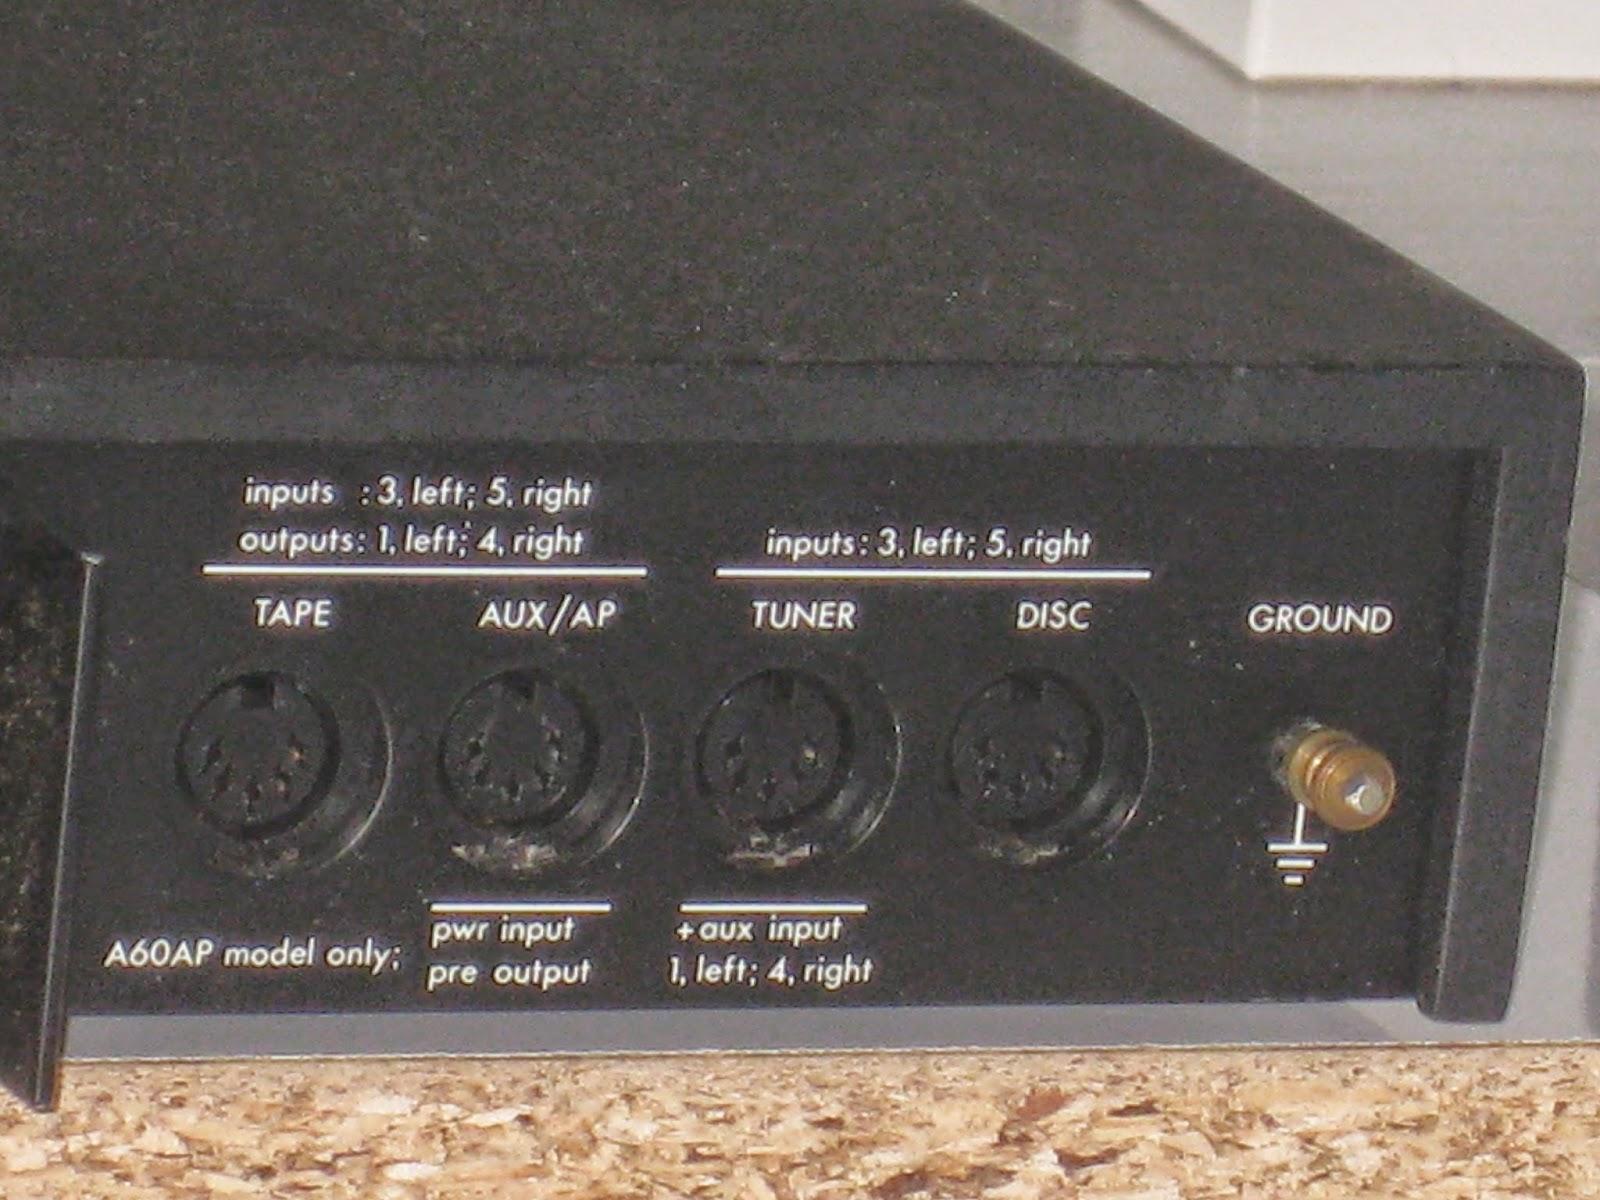 sennheiser mm 450 x manual